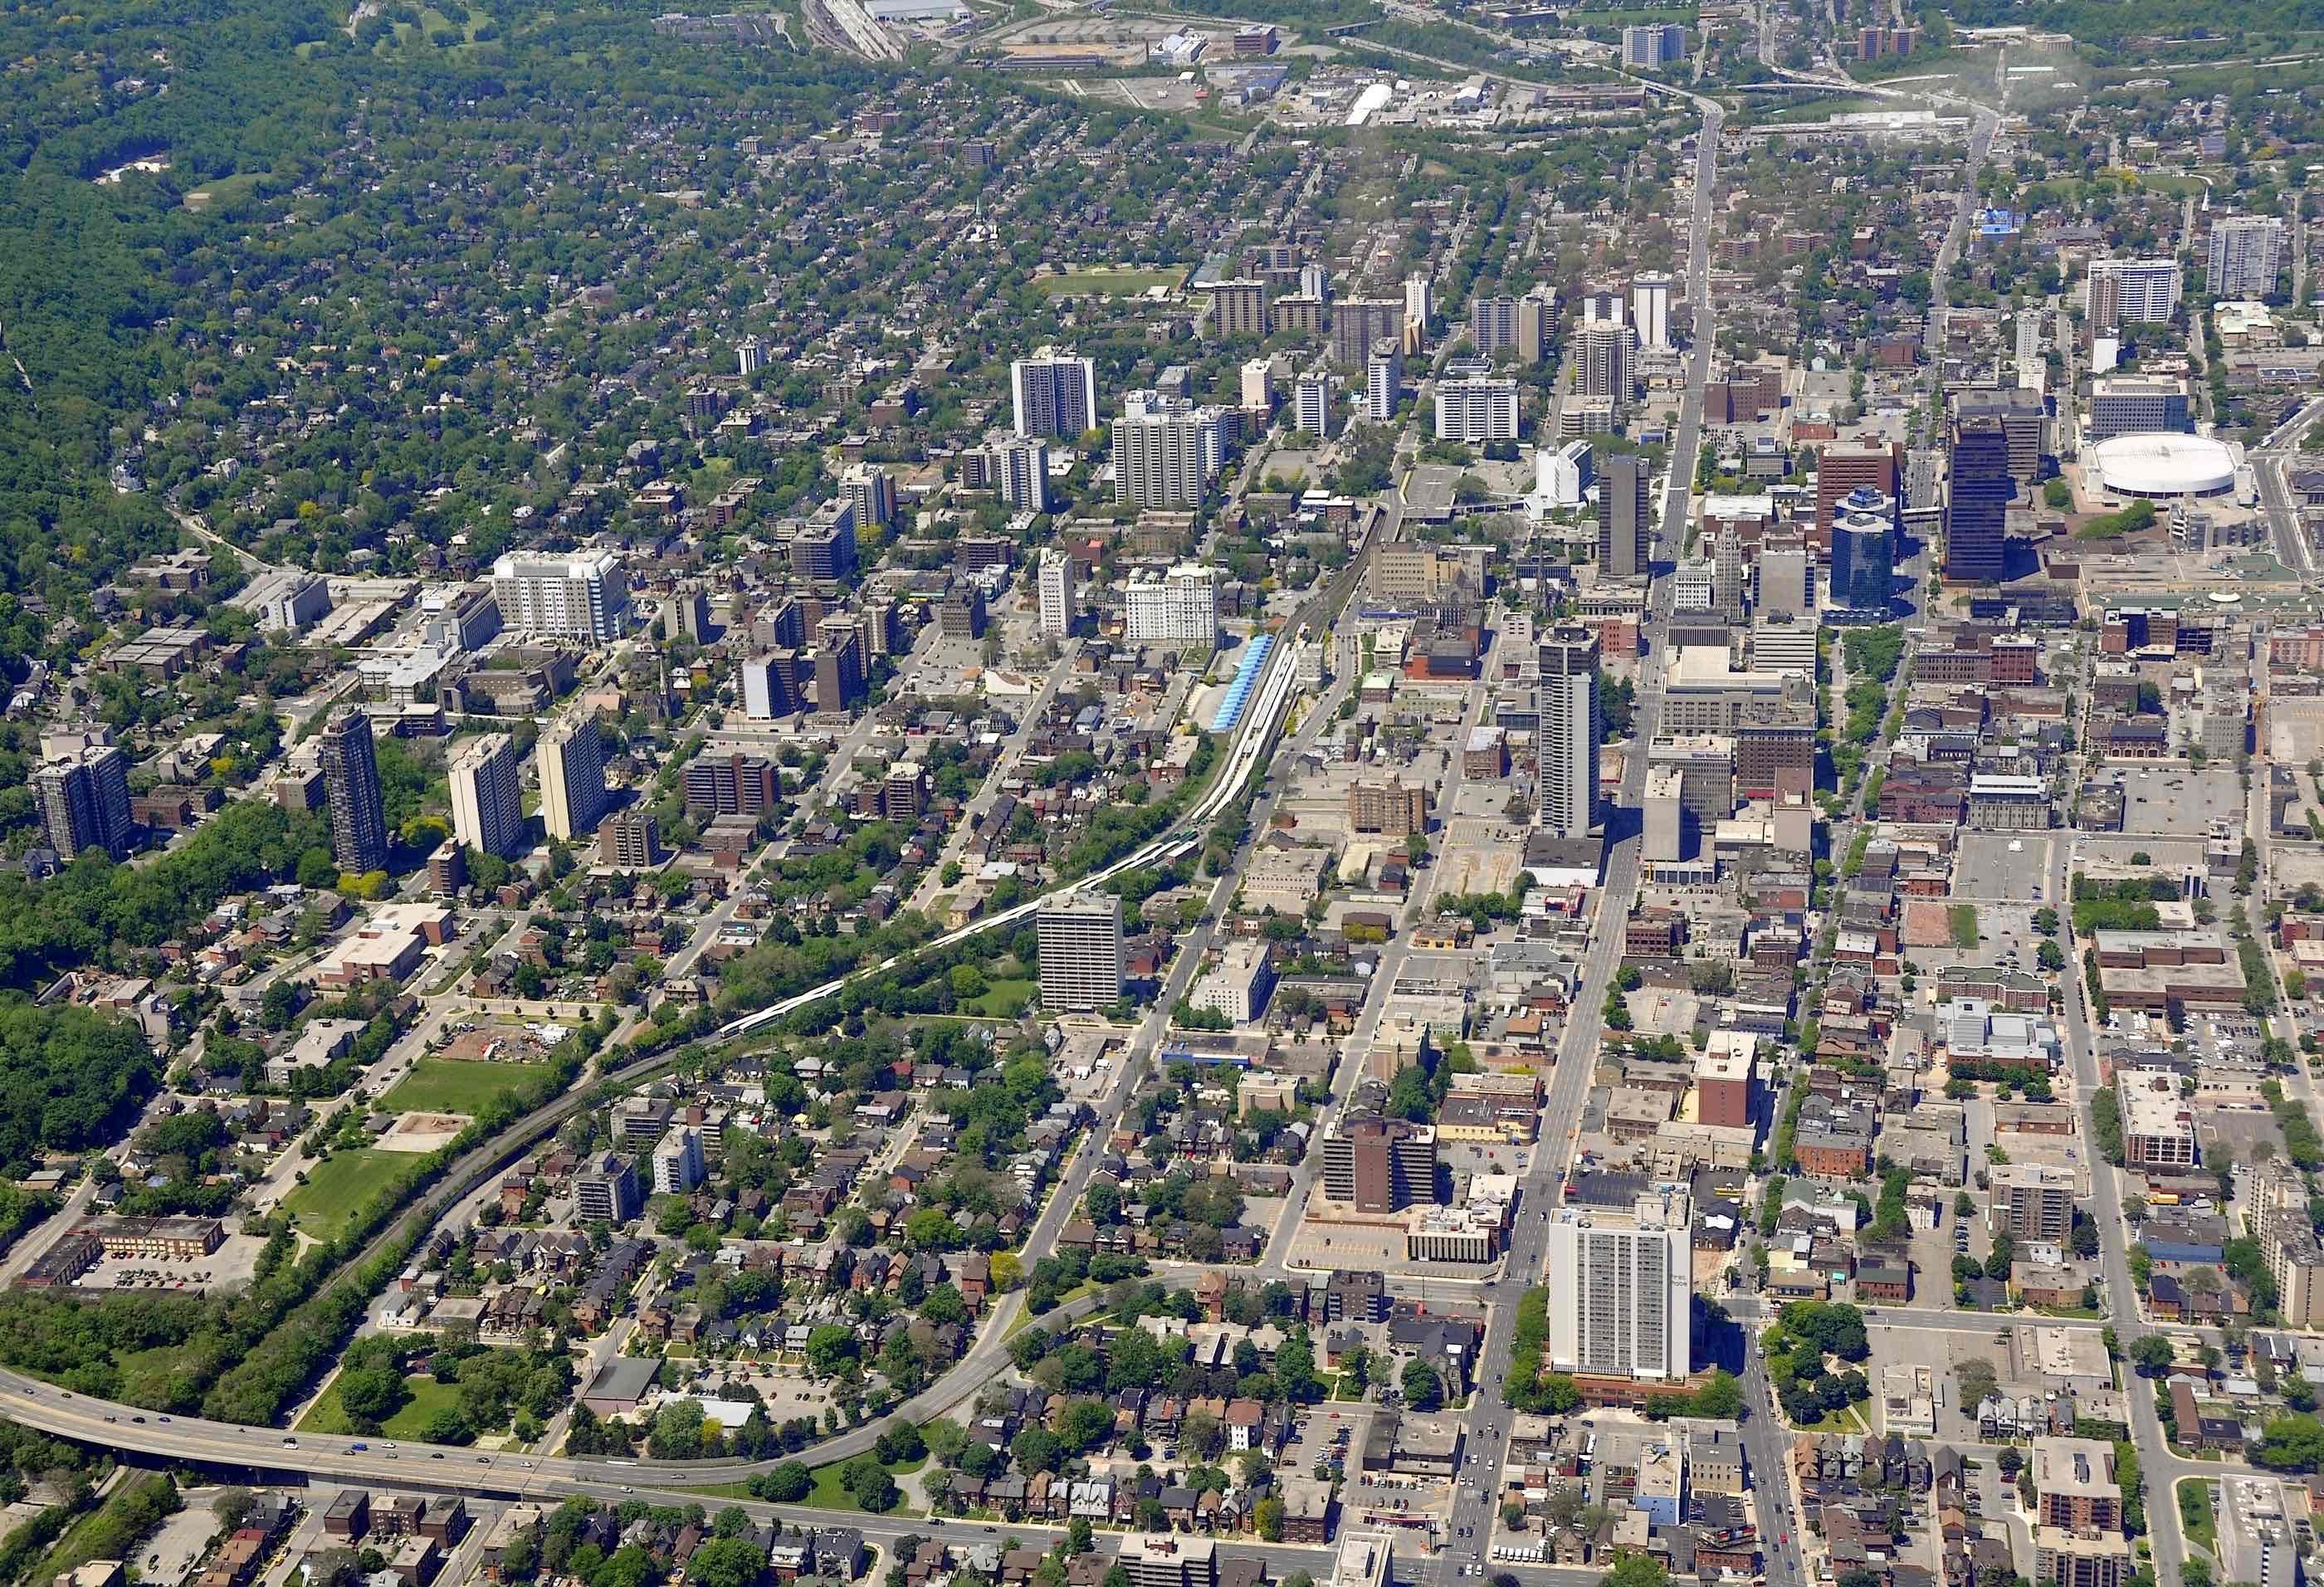 Downtown Hamilton in Ontario, Canada